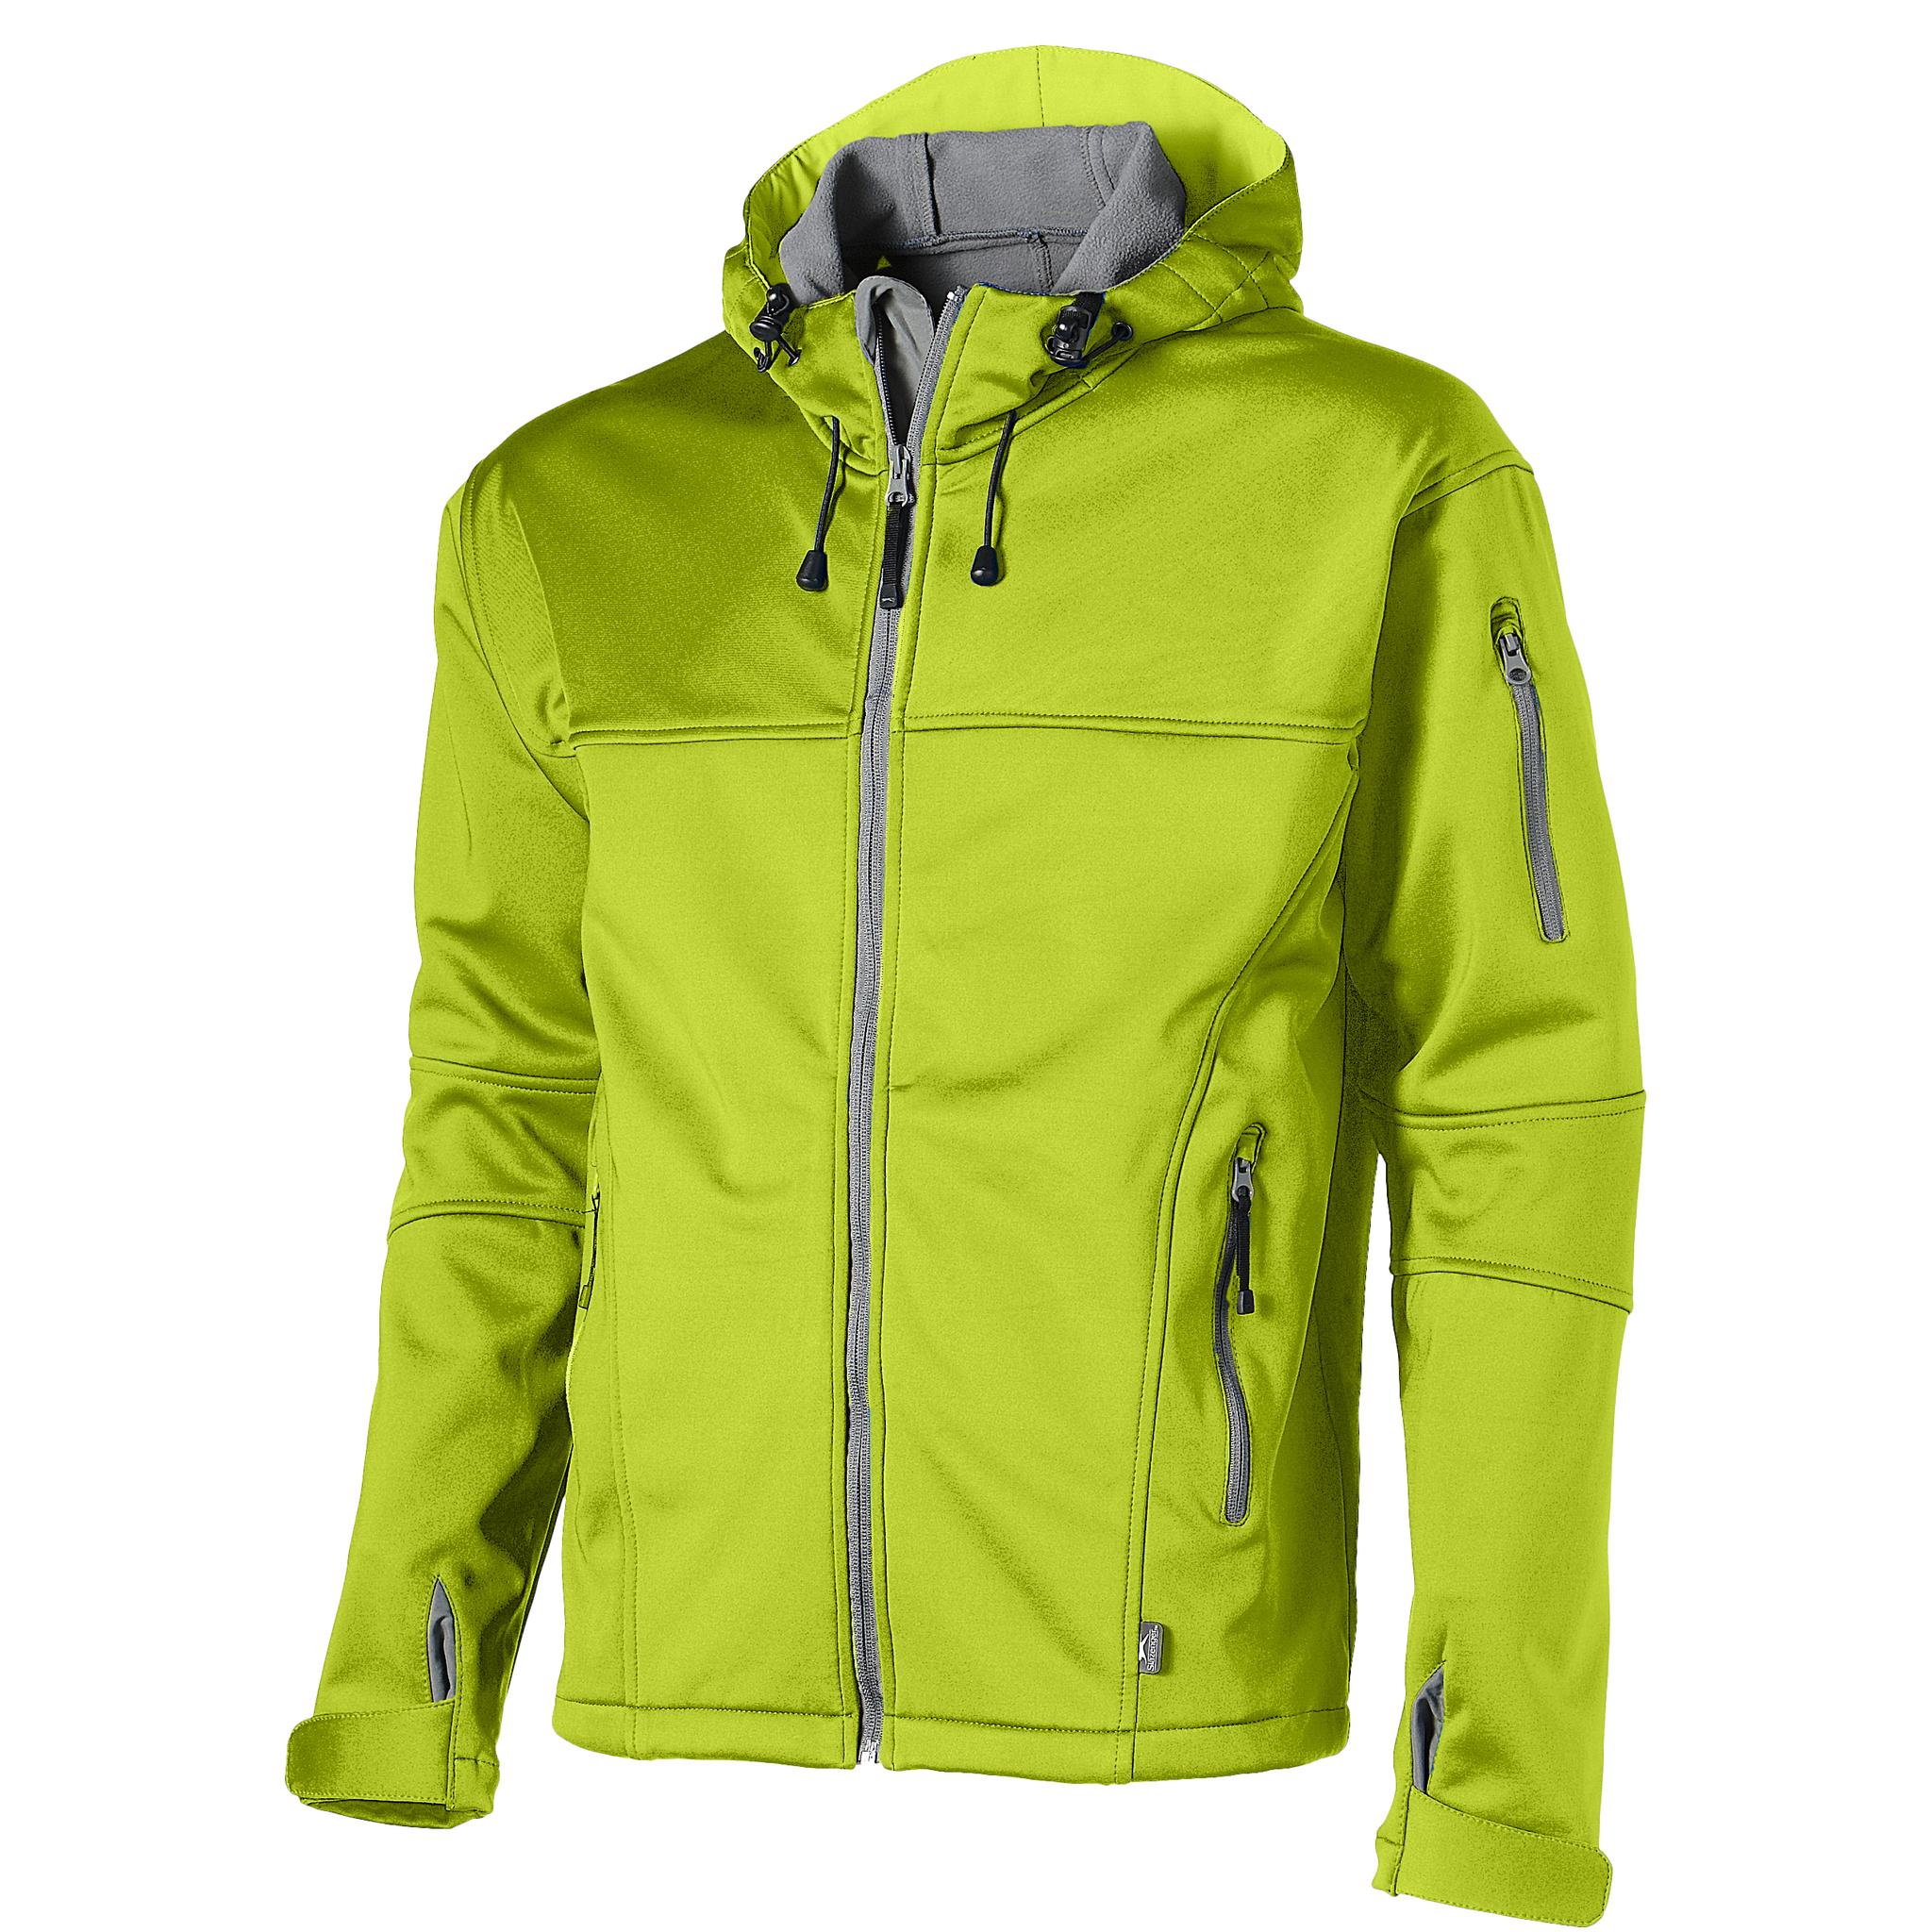 Slazenger Mens Match Softshell Jacket (XXXL) (Mid Green)